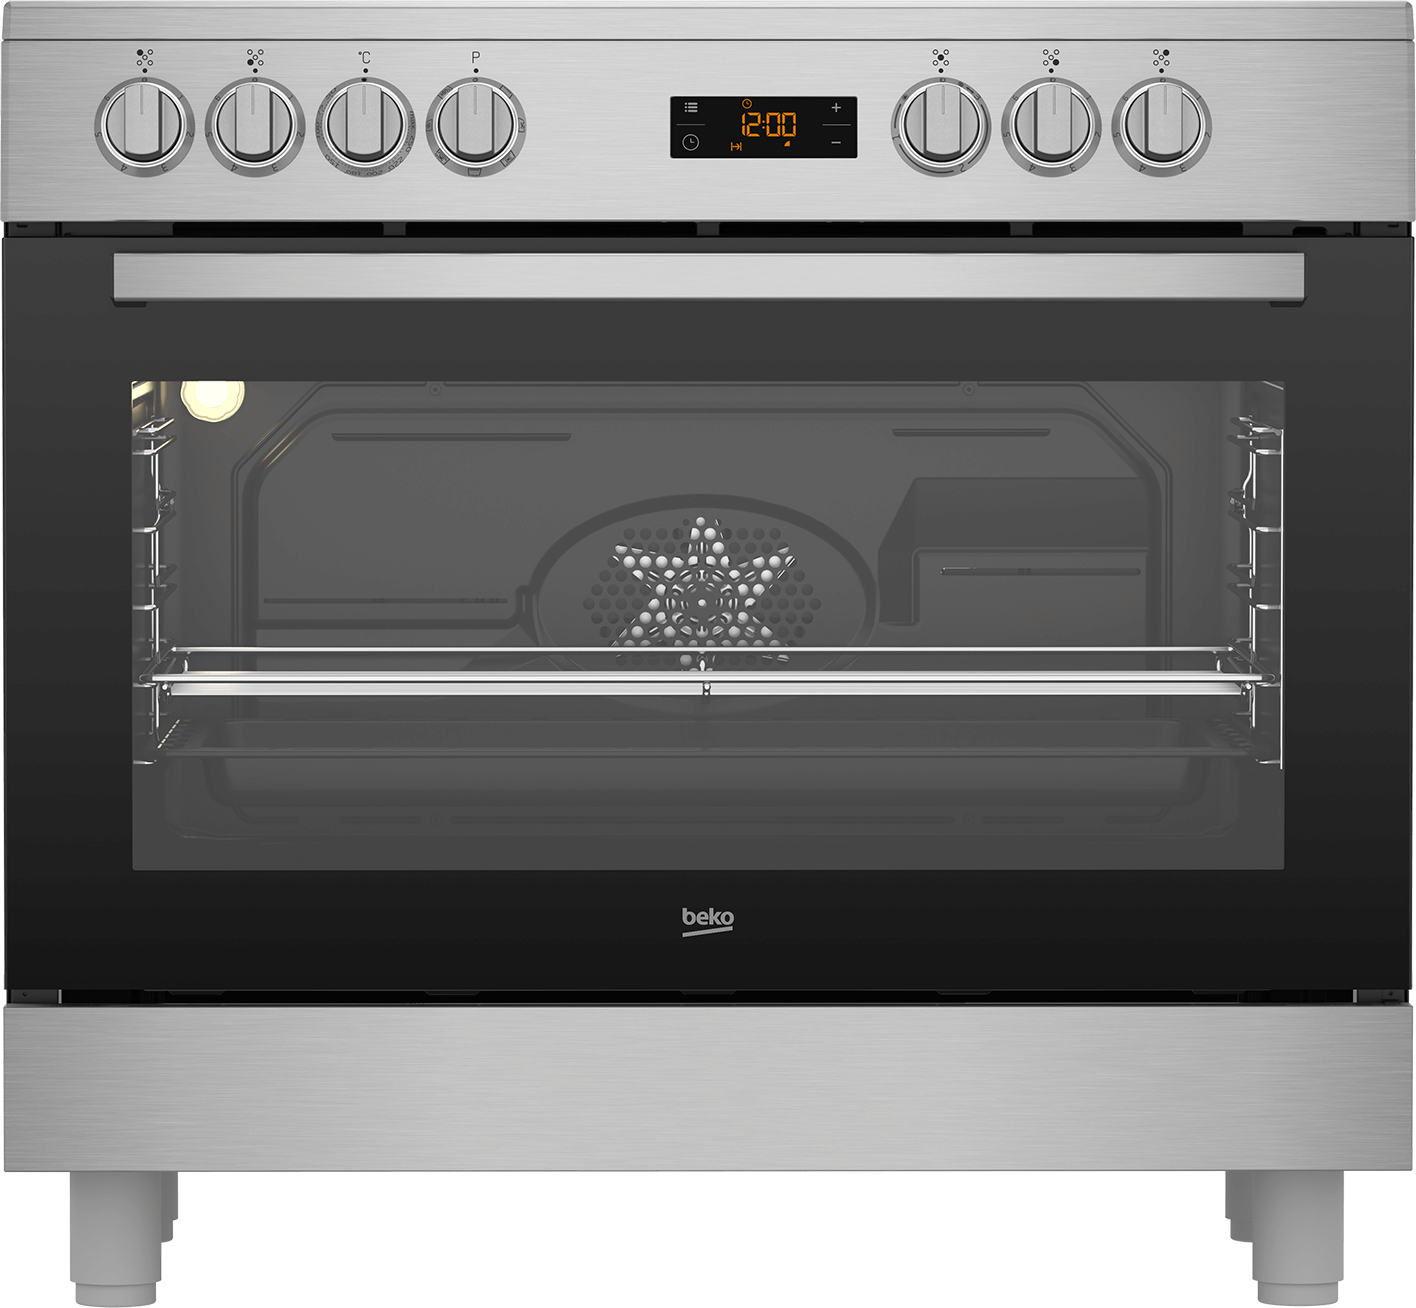 BEKO 90cm Ceramic Electric Cooker GM17300GX